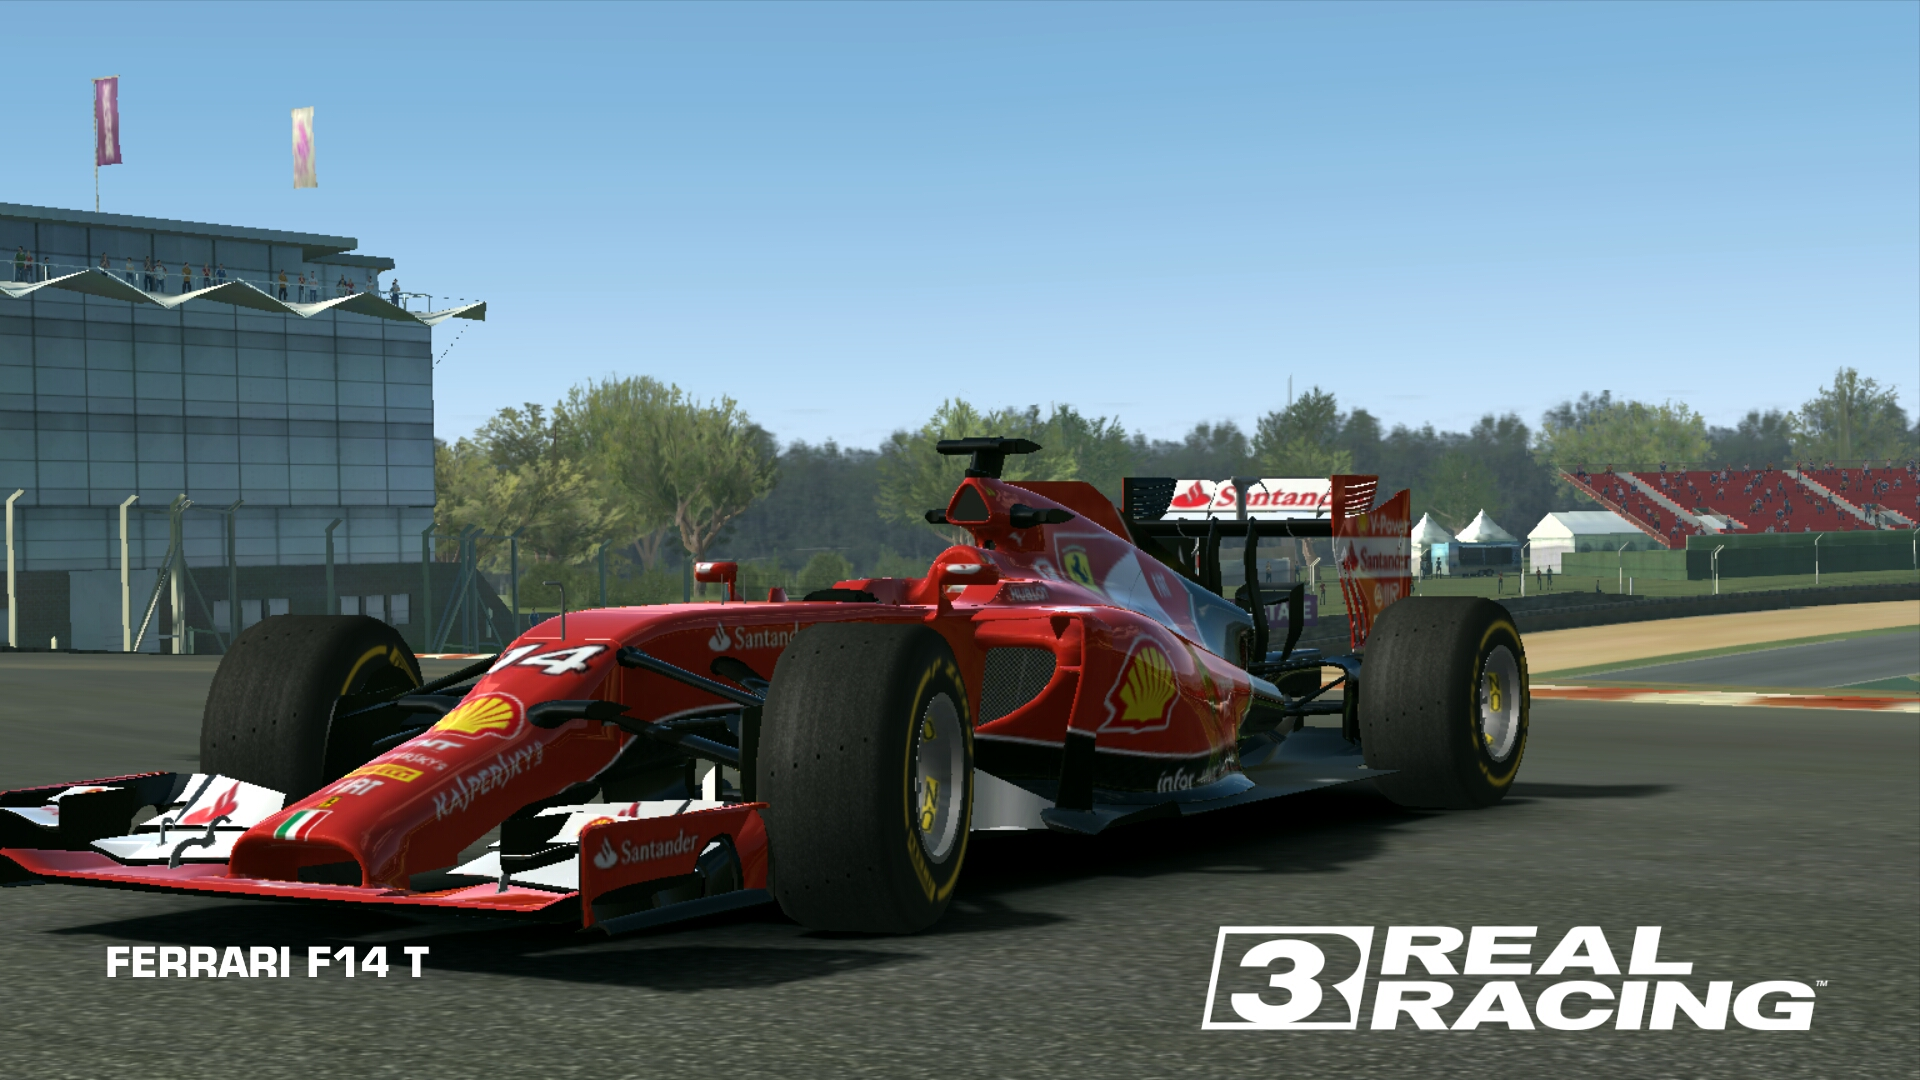 FERRARI F14 T | Real Racing 3 Wiki | FANDOM powered by Wikia